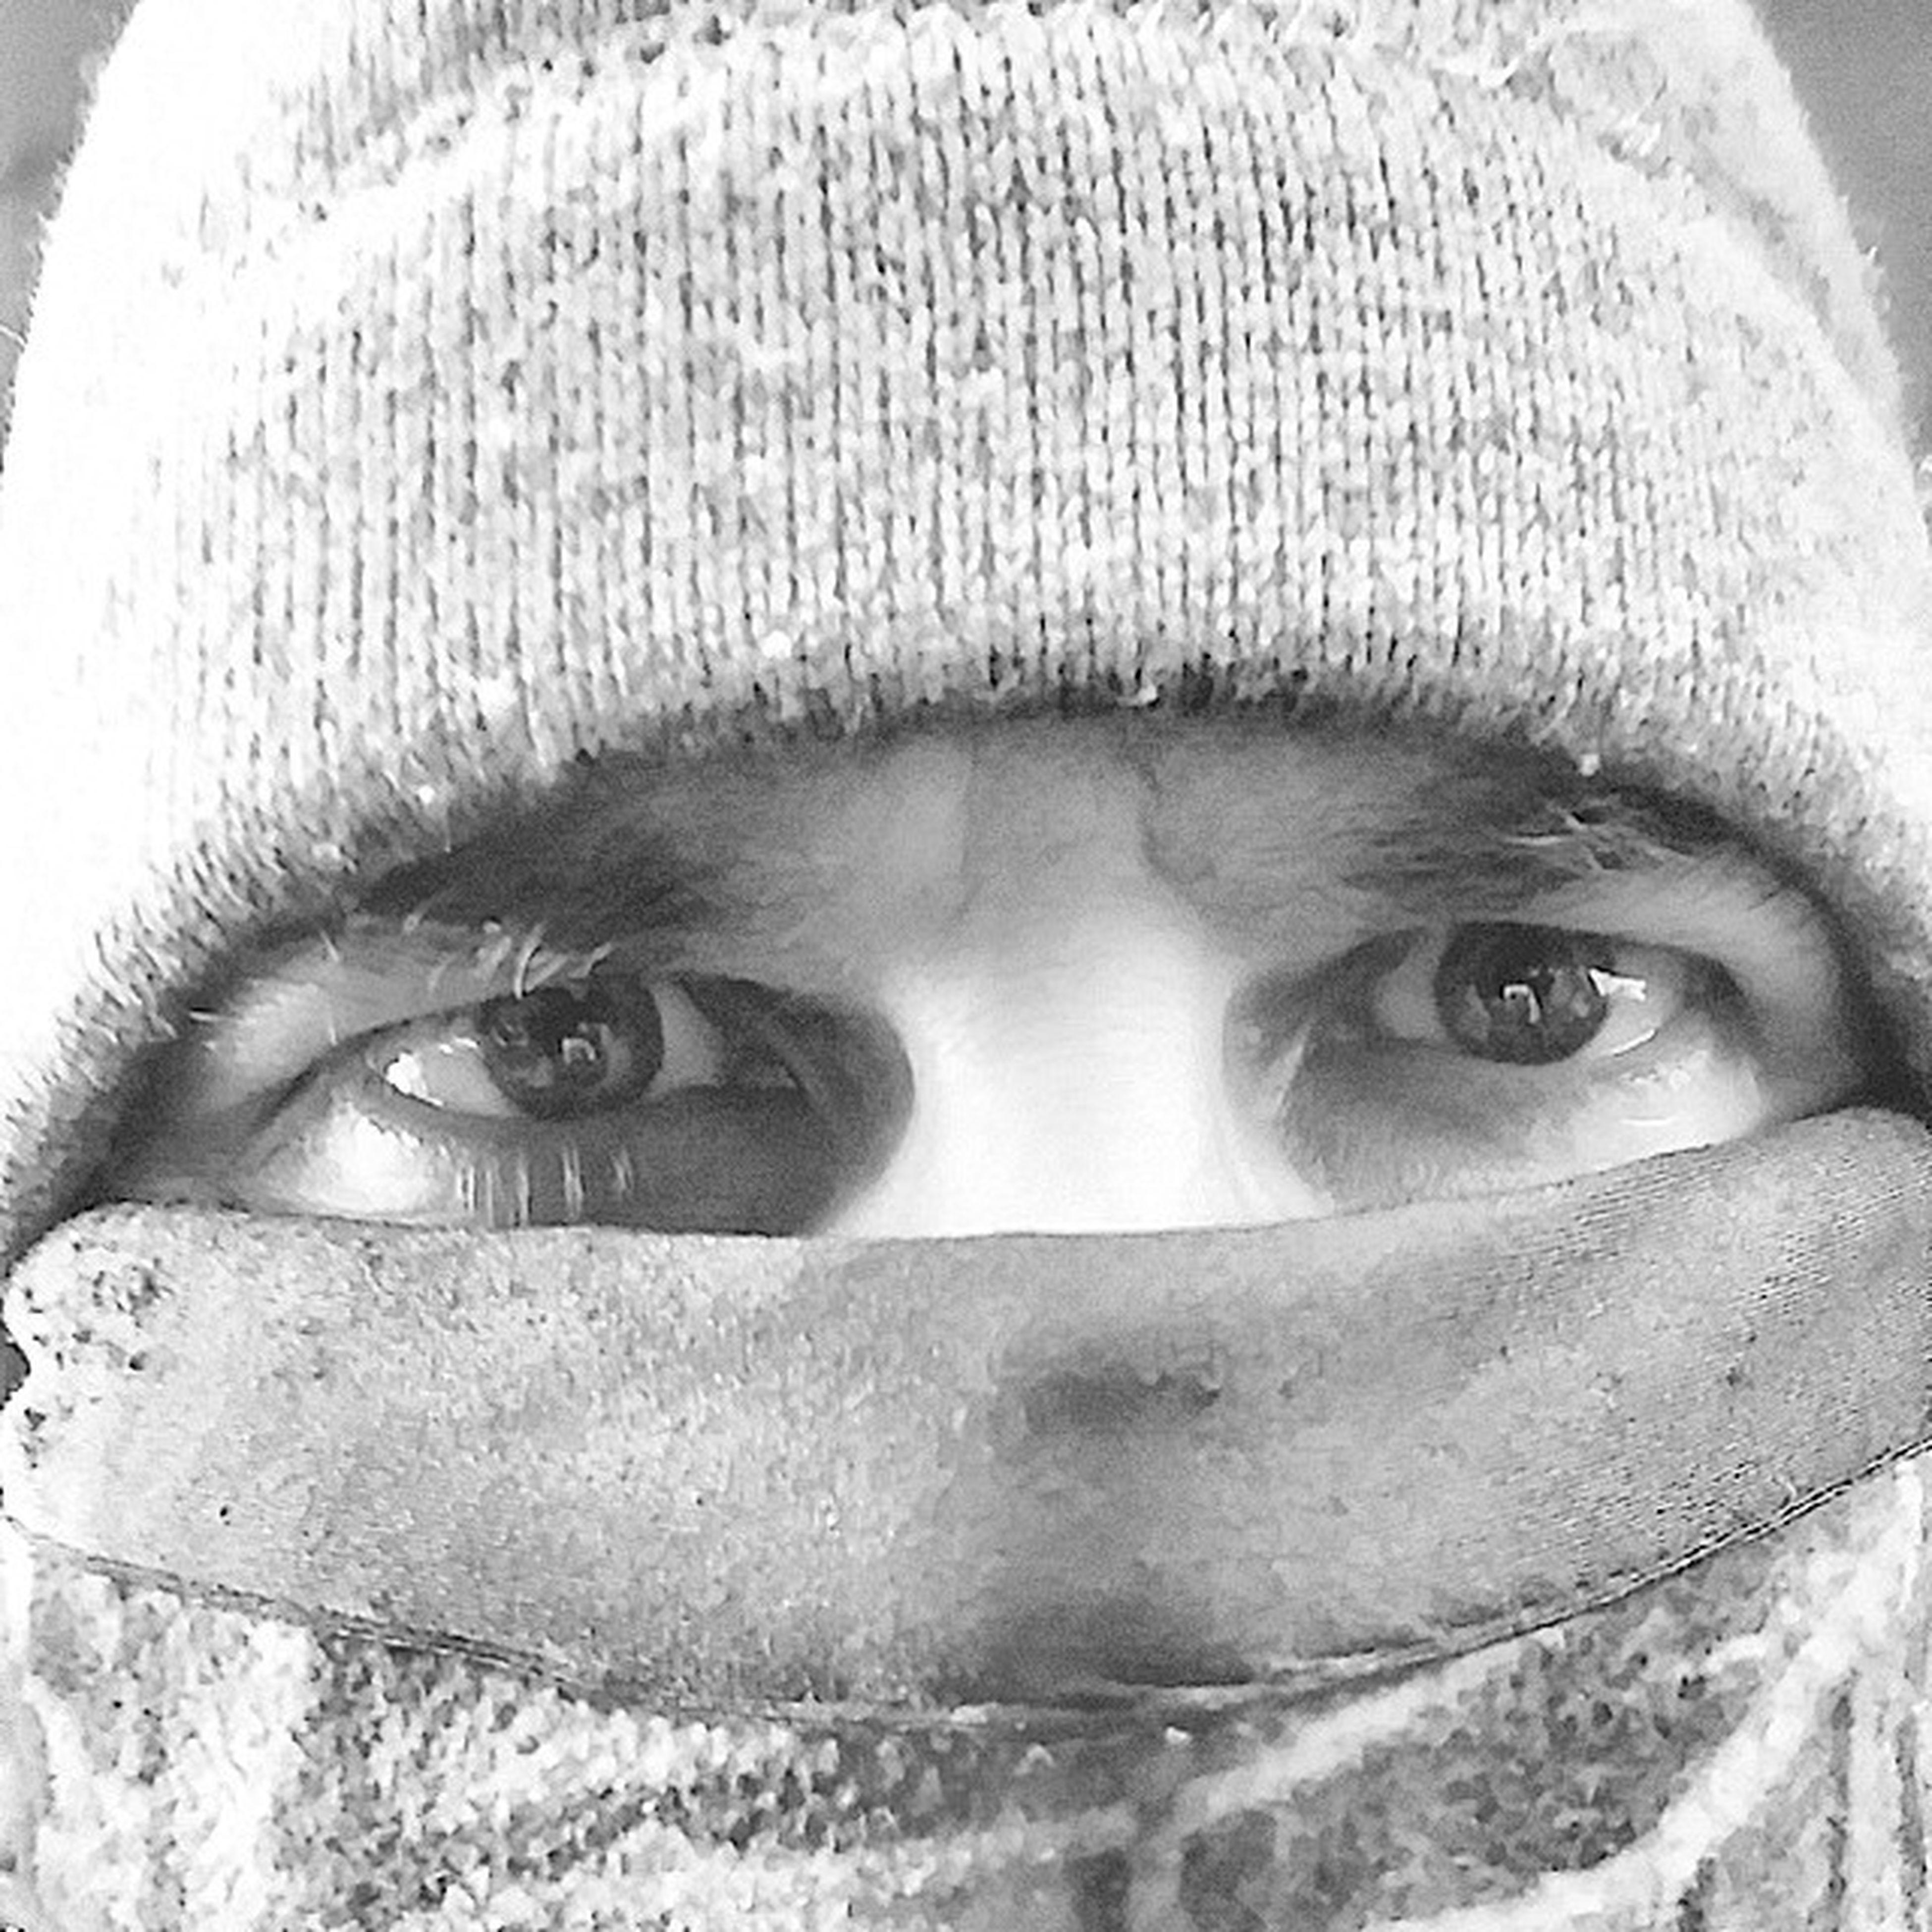 Winterninja Colddays Winter Frostbitekills missingthebeachrightnow Enjoying Life People People Of EyeEm Self Portrait Black And White